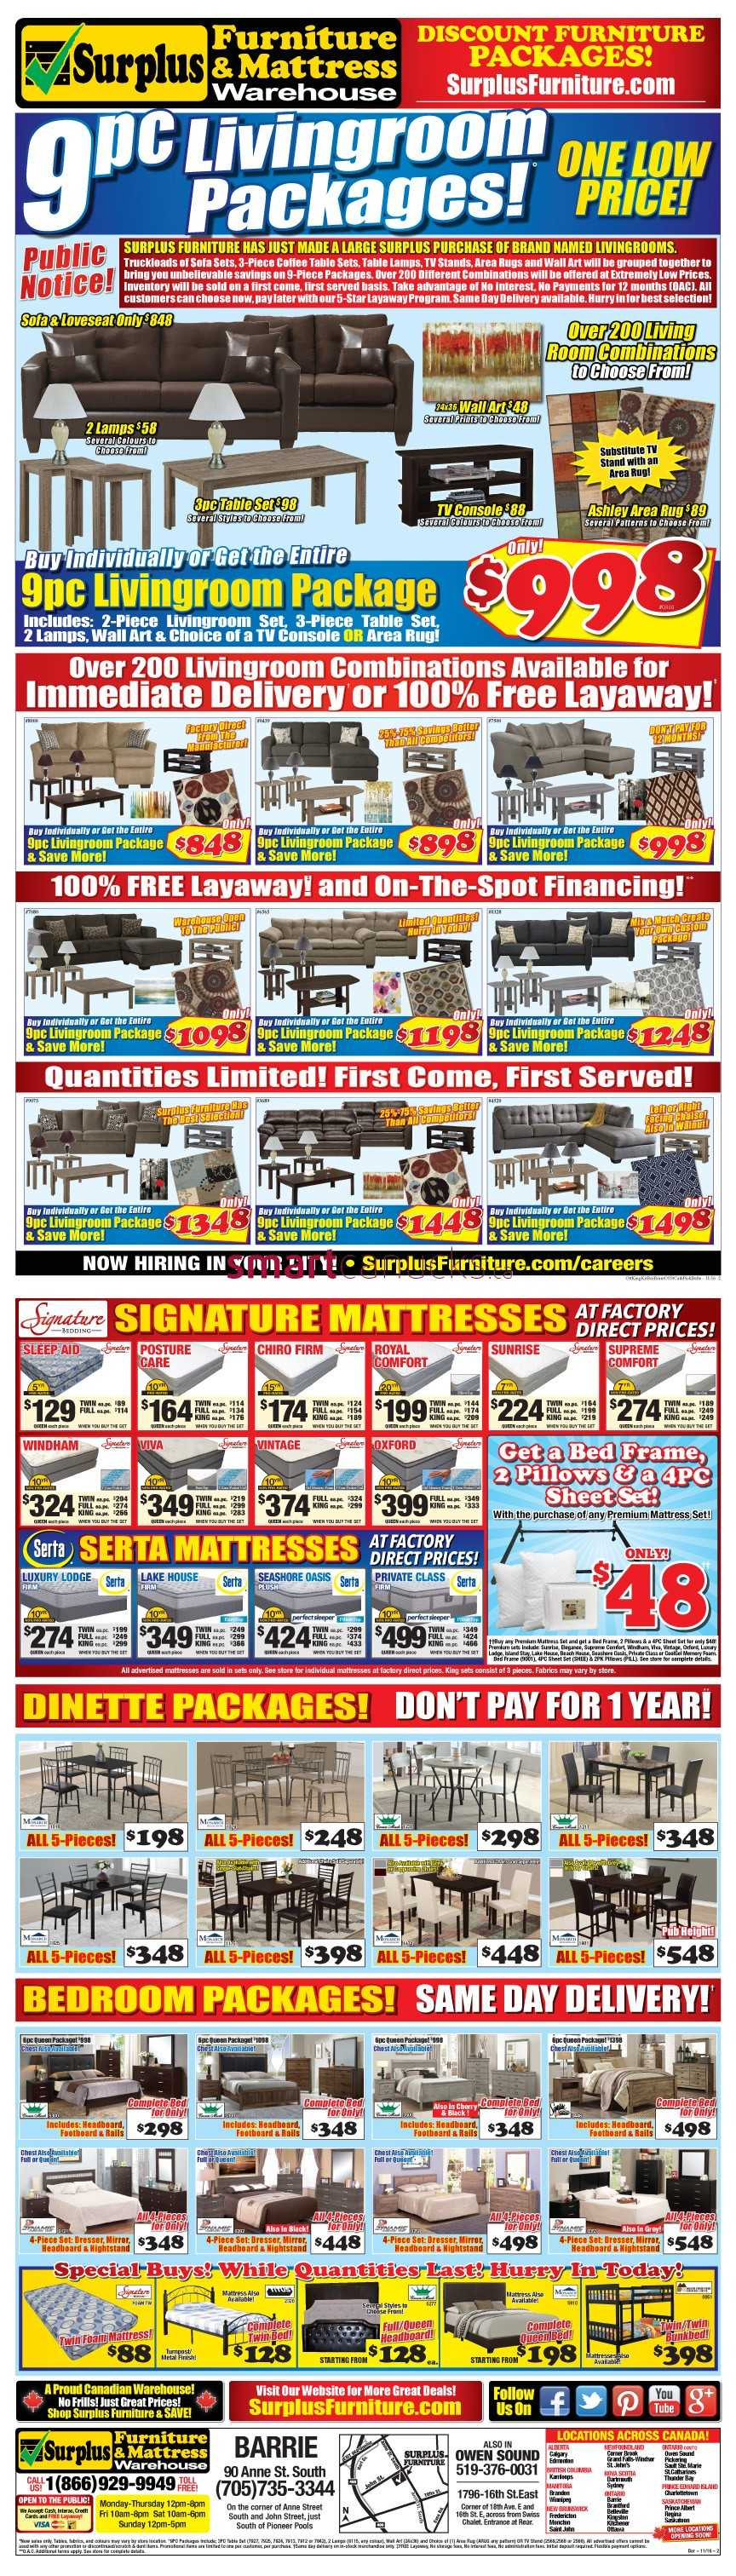 Surplus furniture mattress warehouse barrie flyer for Surplus furniture and mattress barrie